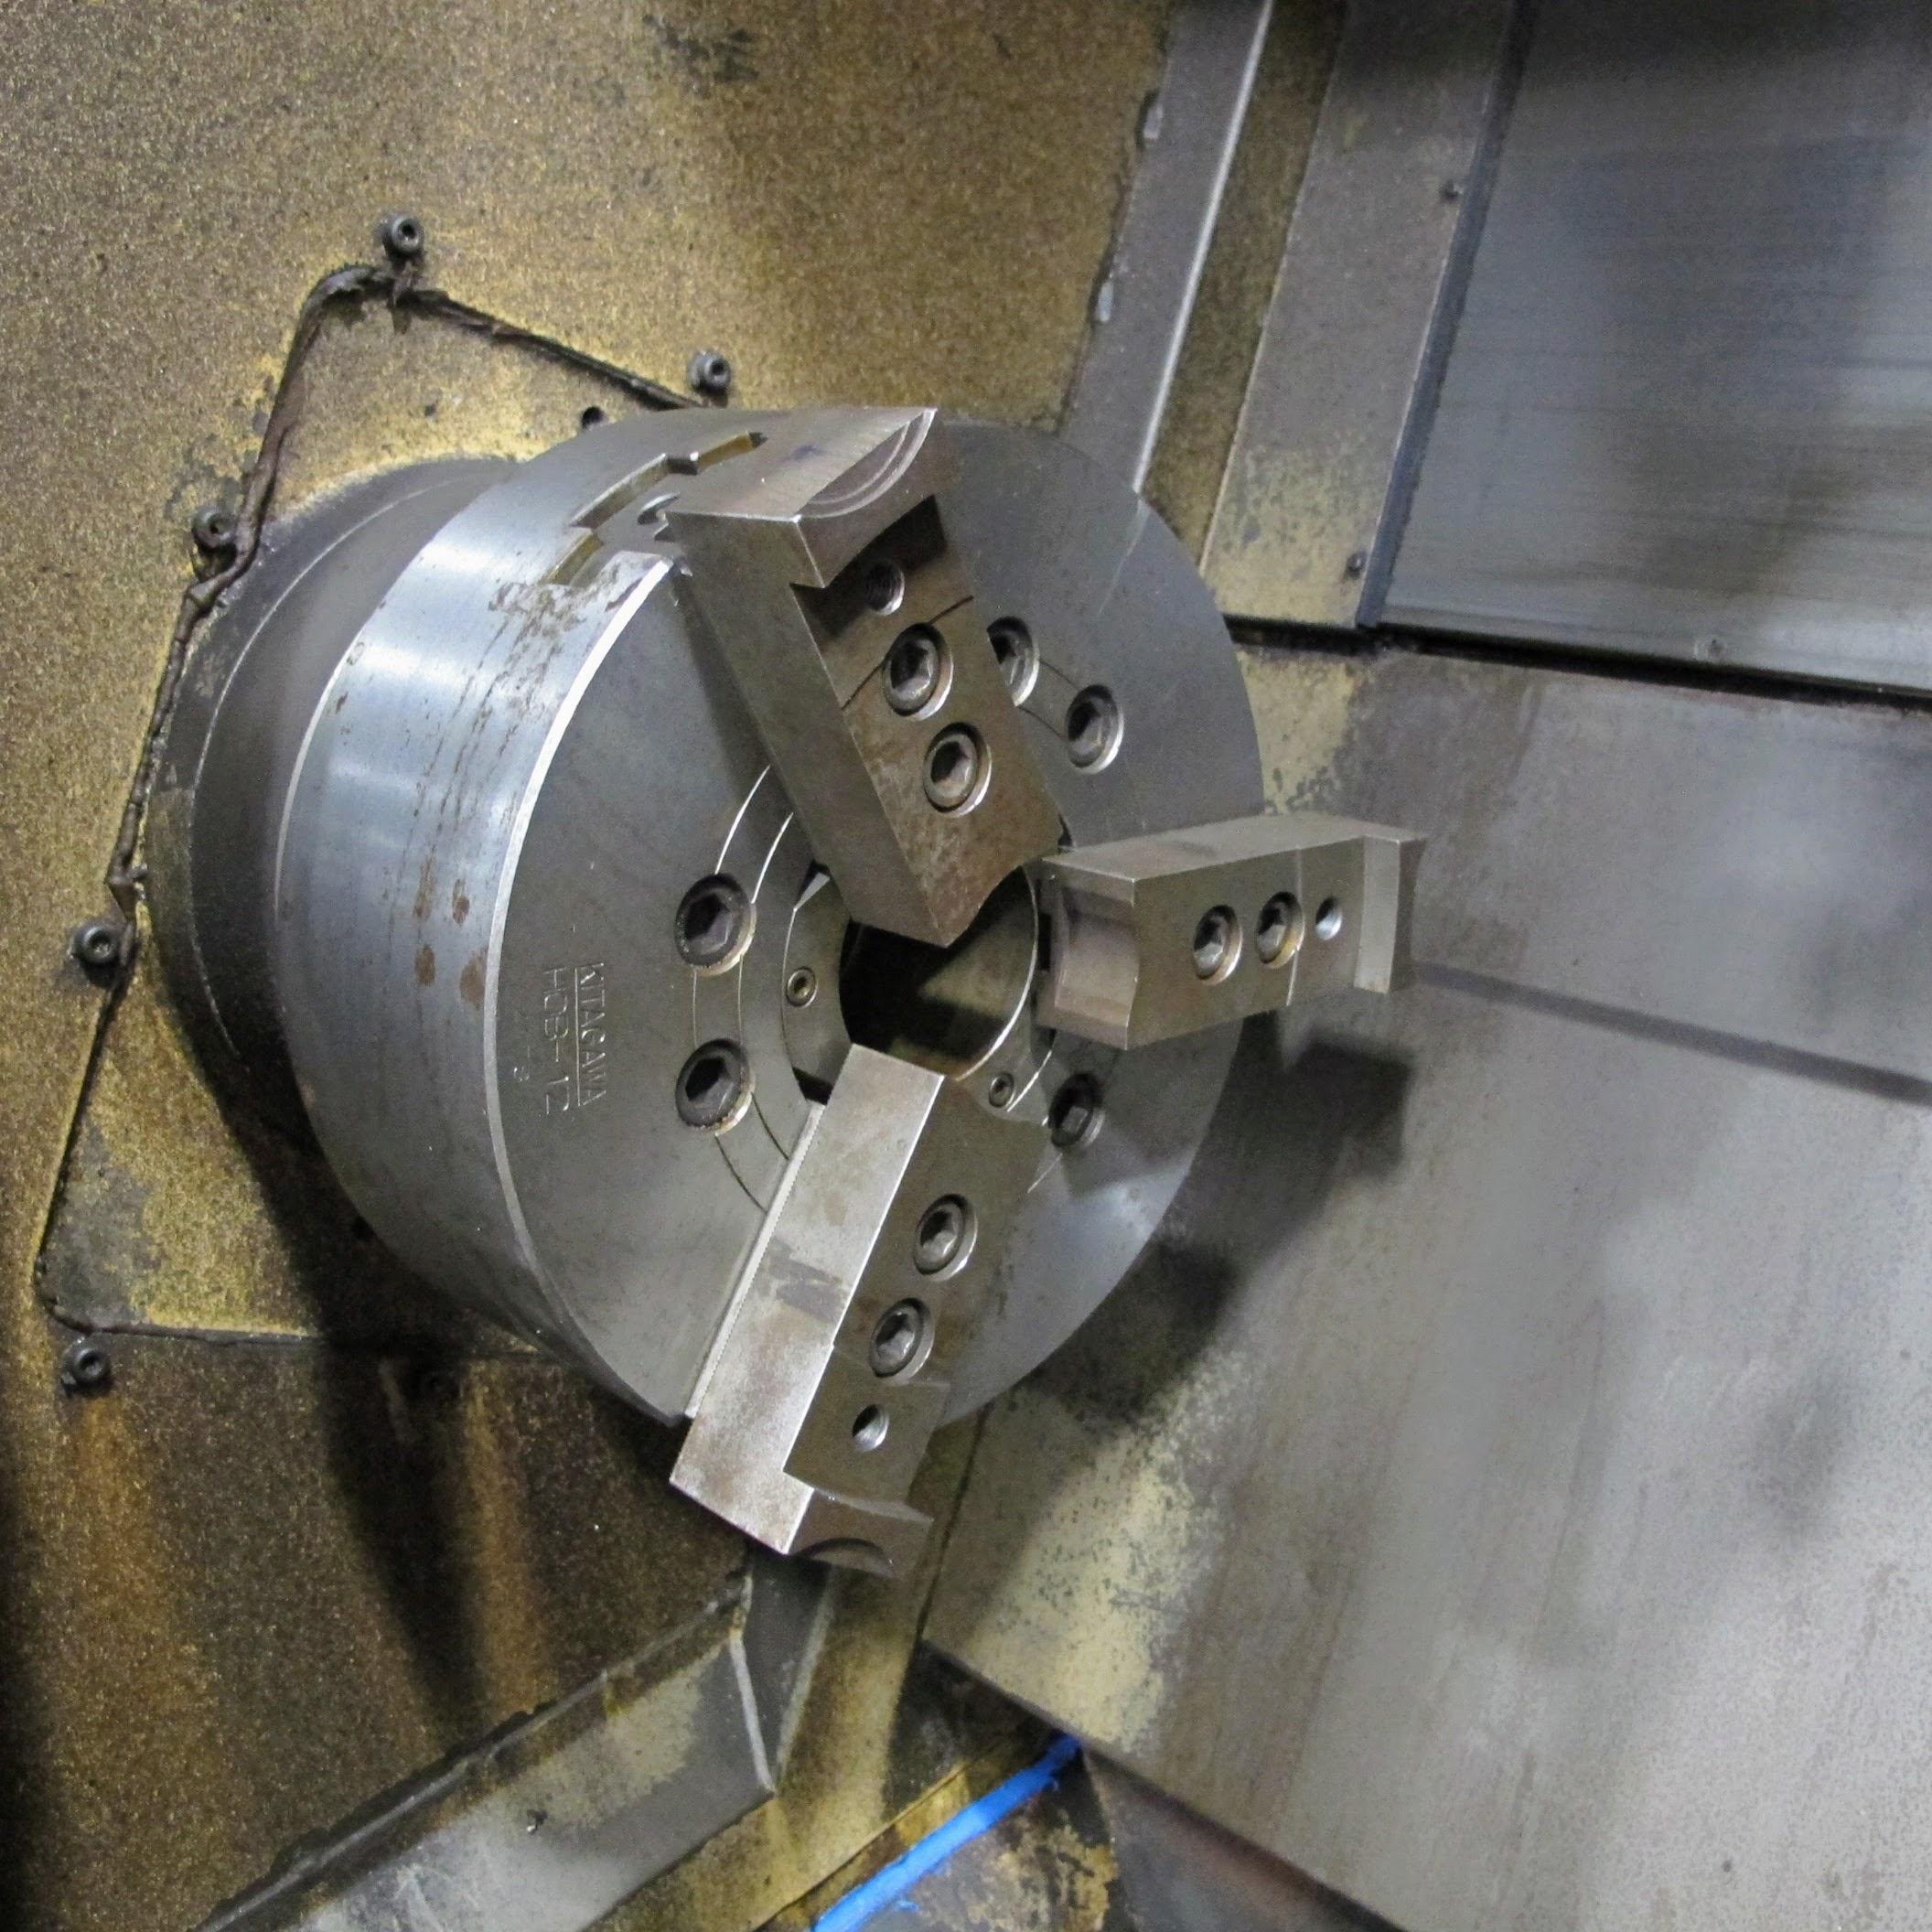 "OKUMA ACT-4 CNC LATHE W/12"" 3 JAW CHUCK, FANUC CONTROL, TAIL STOCK, ATC-12 W/10 TOOL HOLDERS, - Image 14 of 17"